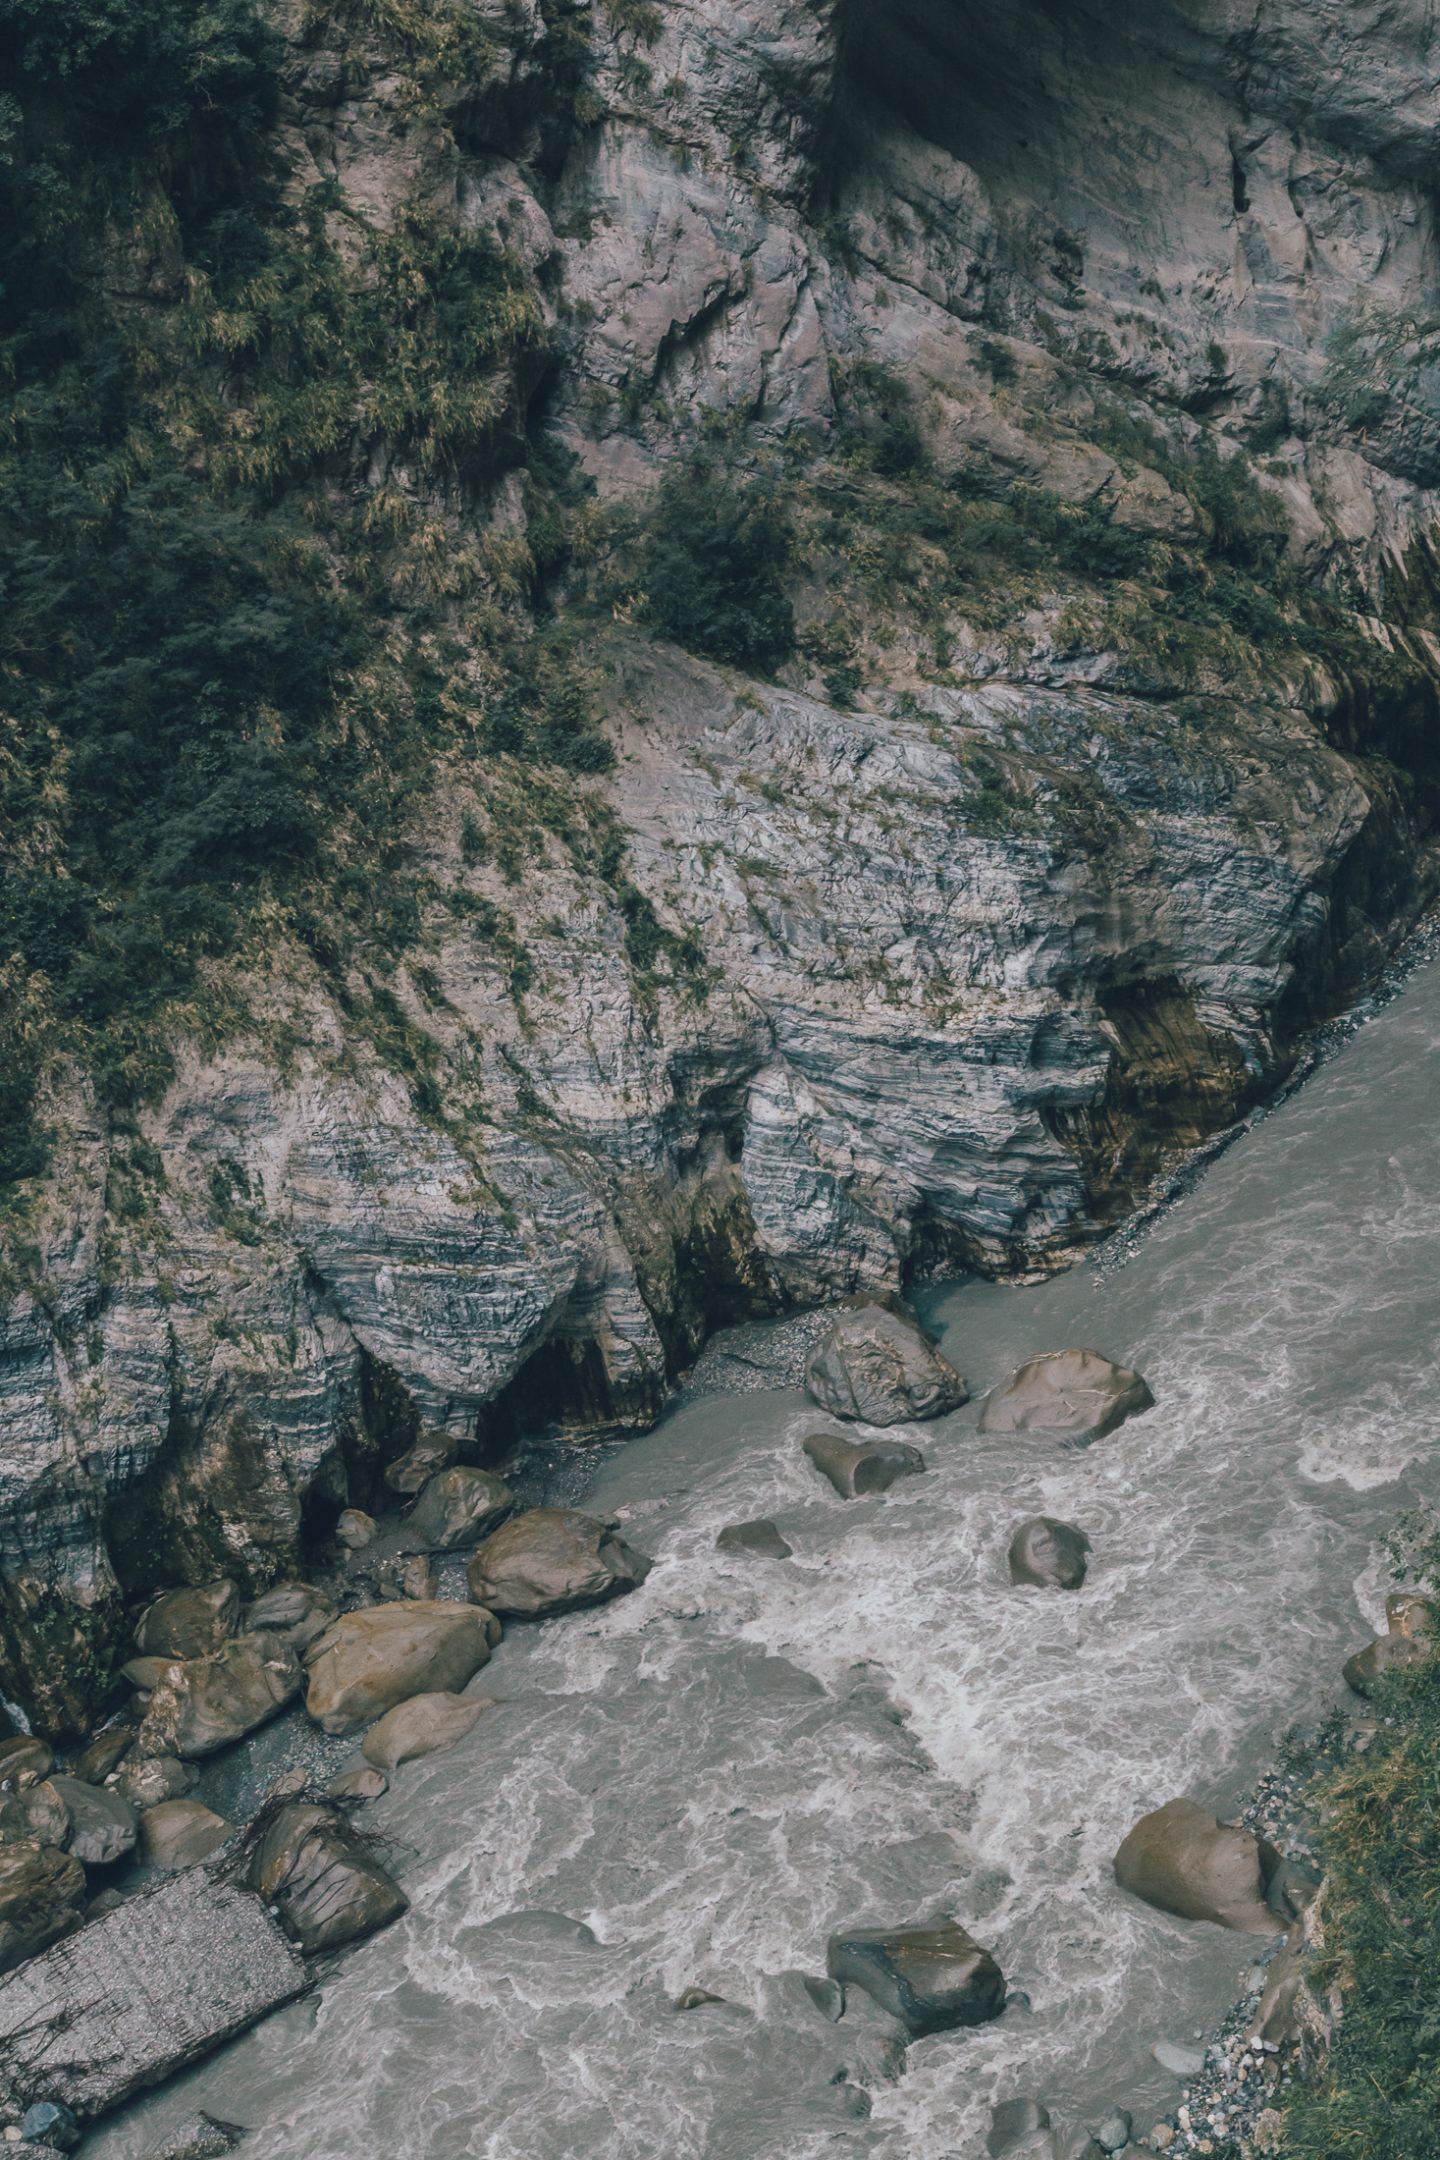 Ущелье Тароко, Хуалянь, Тайвань Хуалянь 23 увлекательных занятия в Хуалянь, Тайвань Hualien67 1440x2160